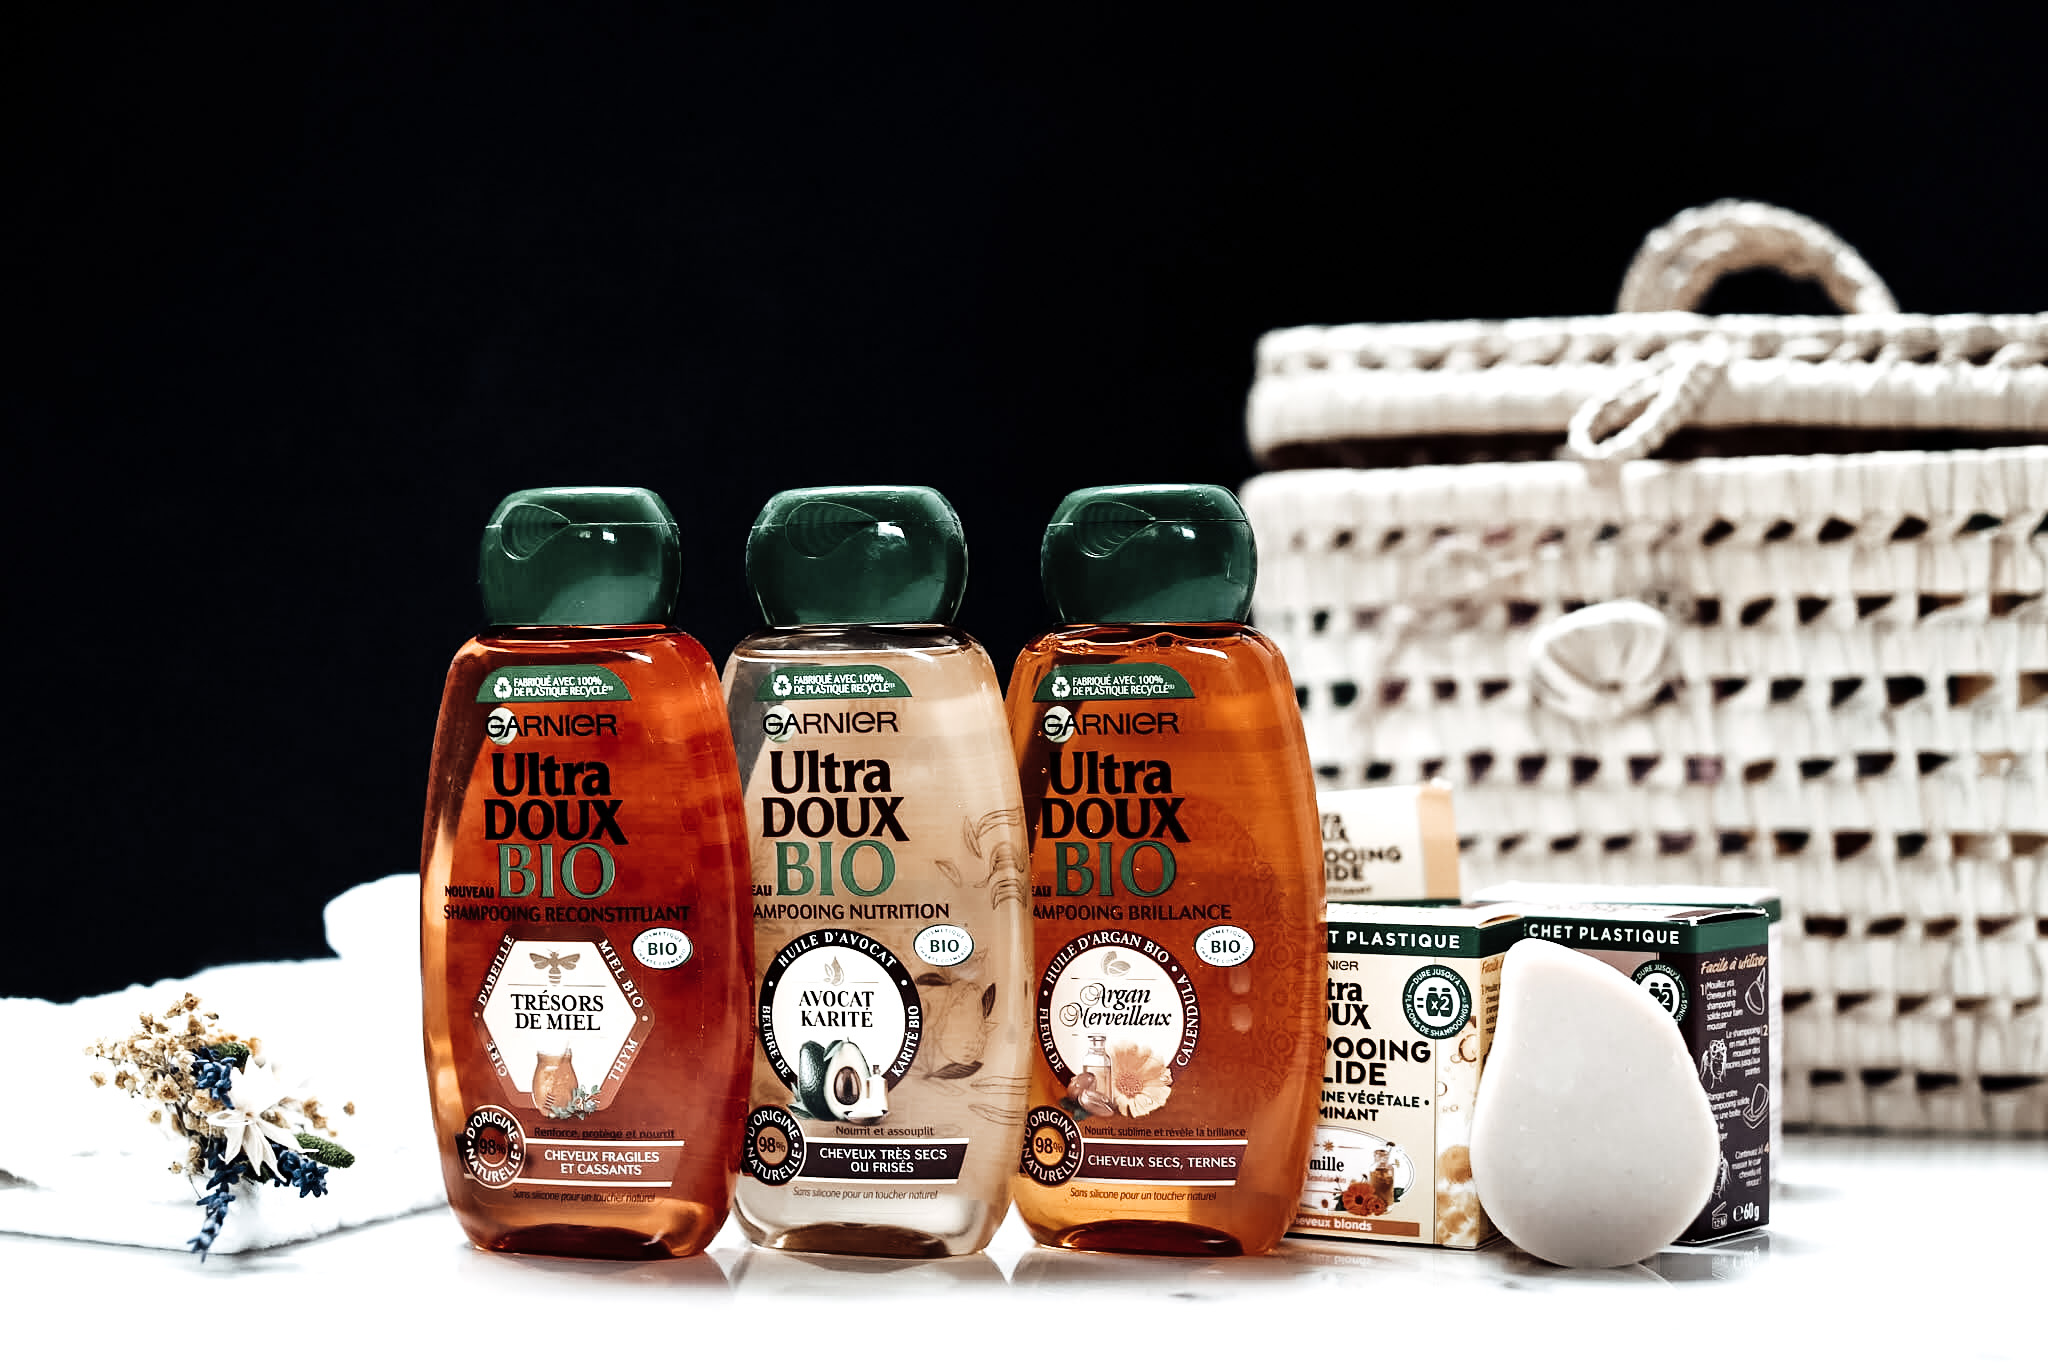 Garnier Ultra Doux Shampoong Bio